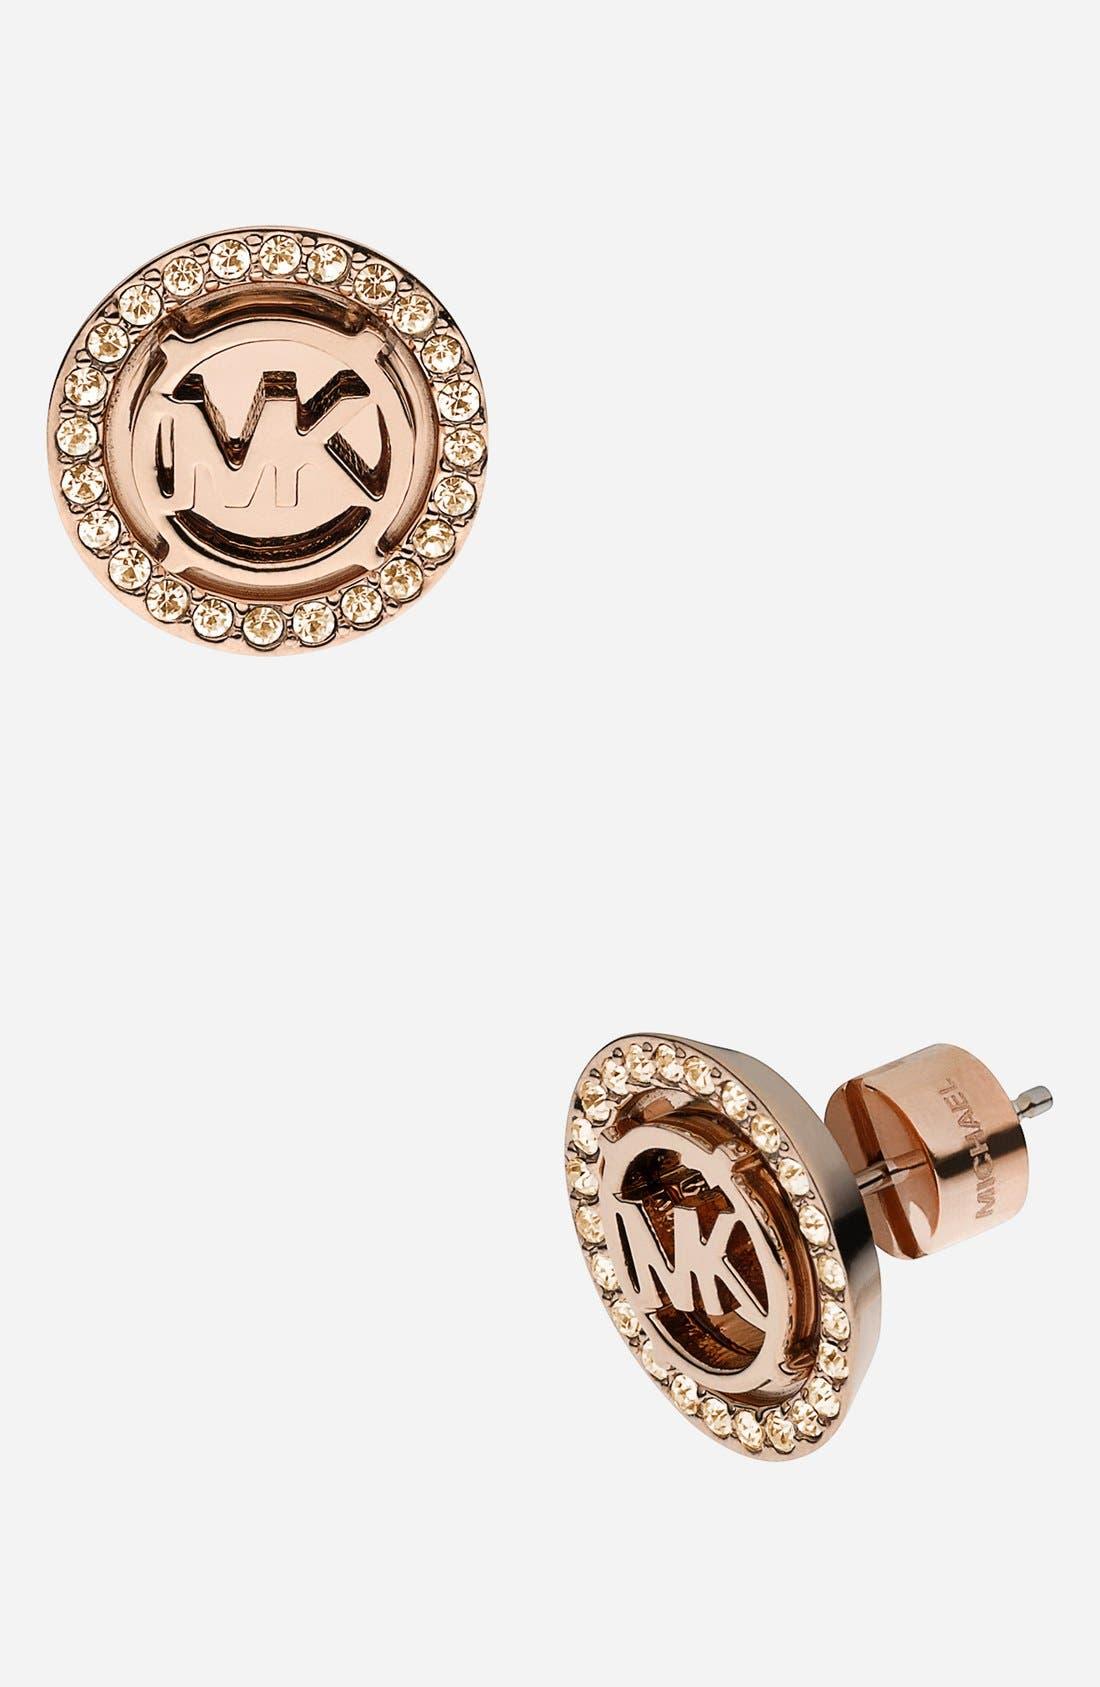 Michael Kors 'Monogram' Stud Earrings,                         Main,                         color, Rose Gold/ Gold Quartz